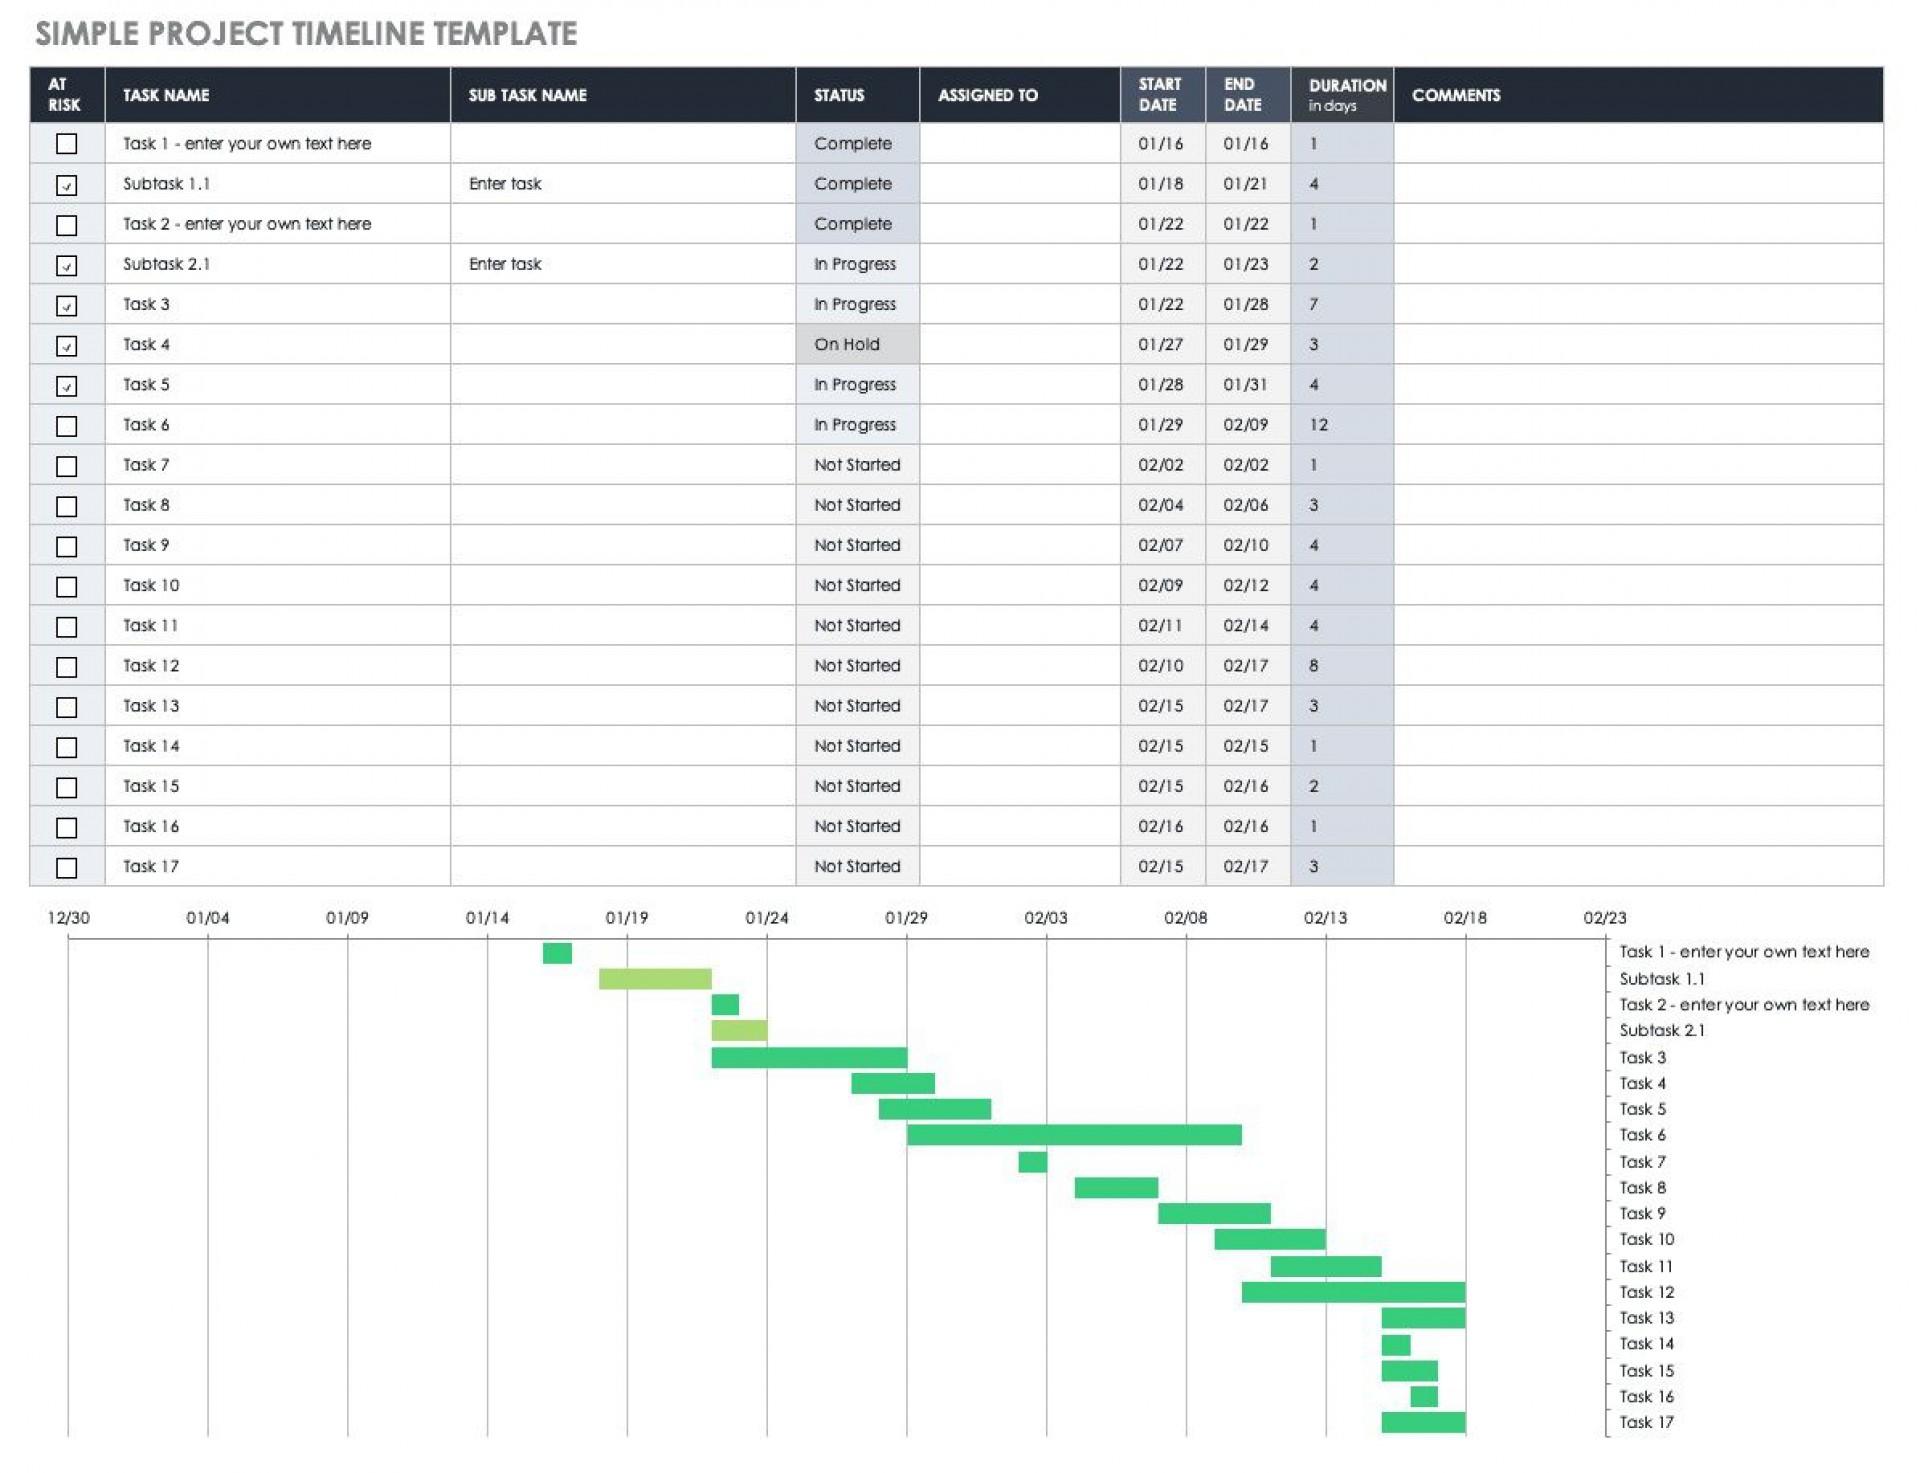 005 Surprising Project Management Timeline Template Inspiration  Plan Pmbok Planner1920